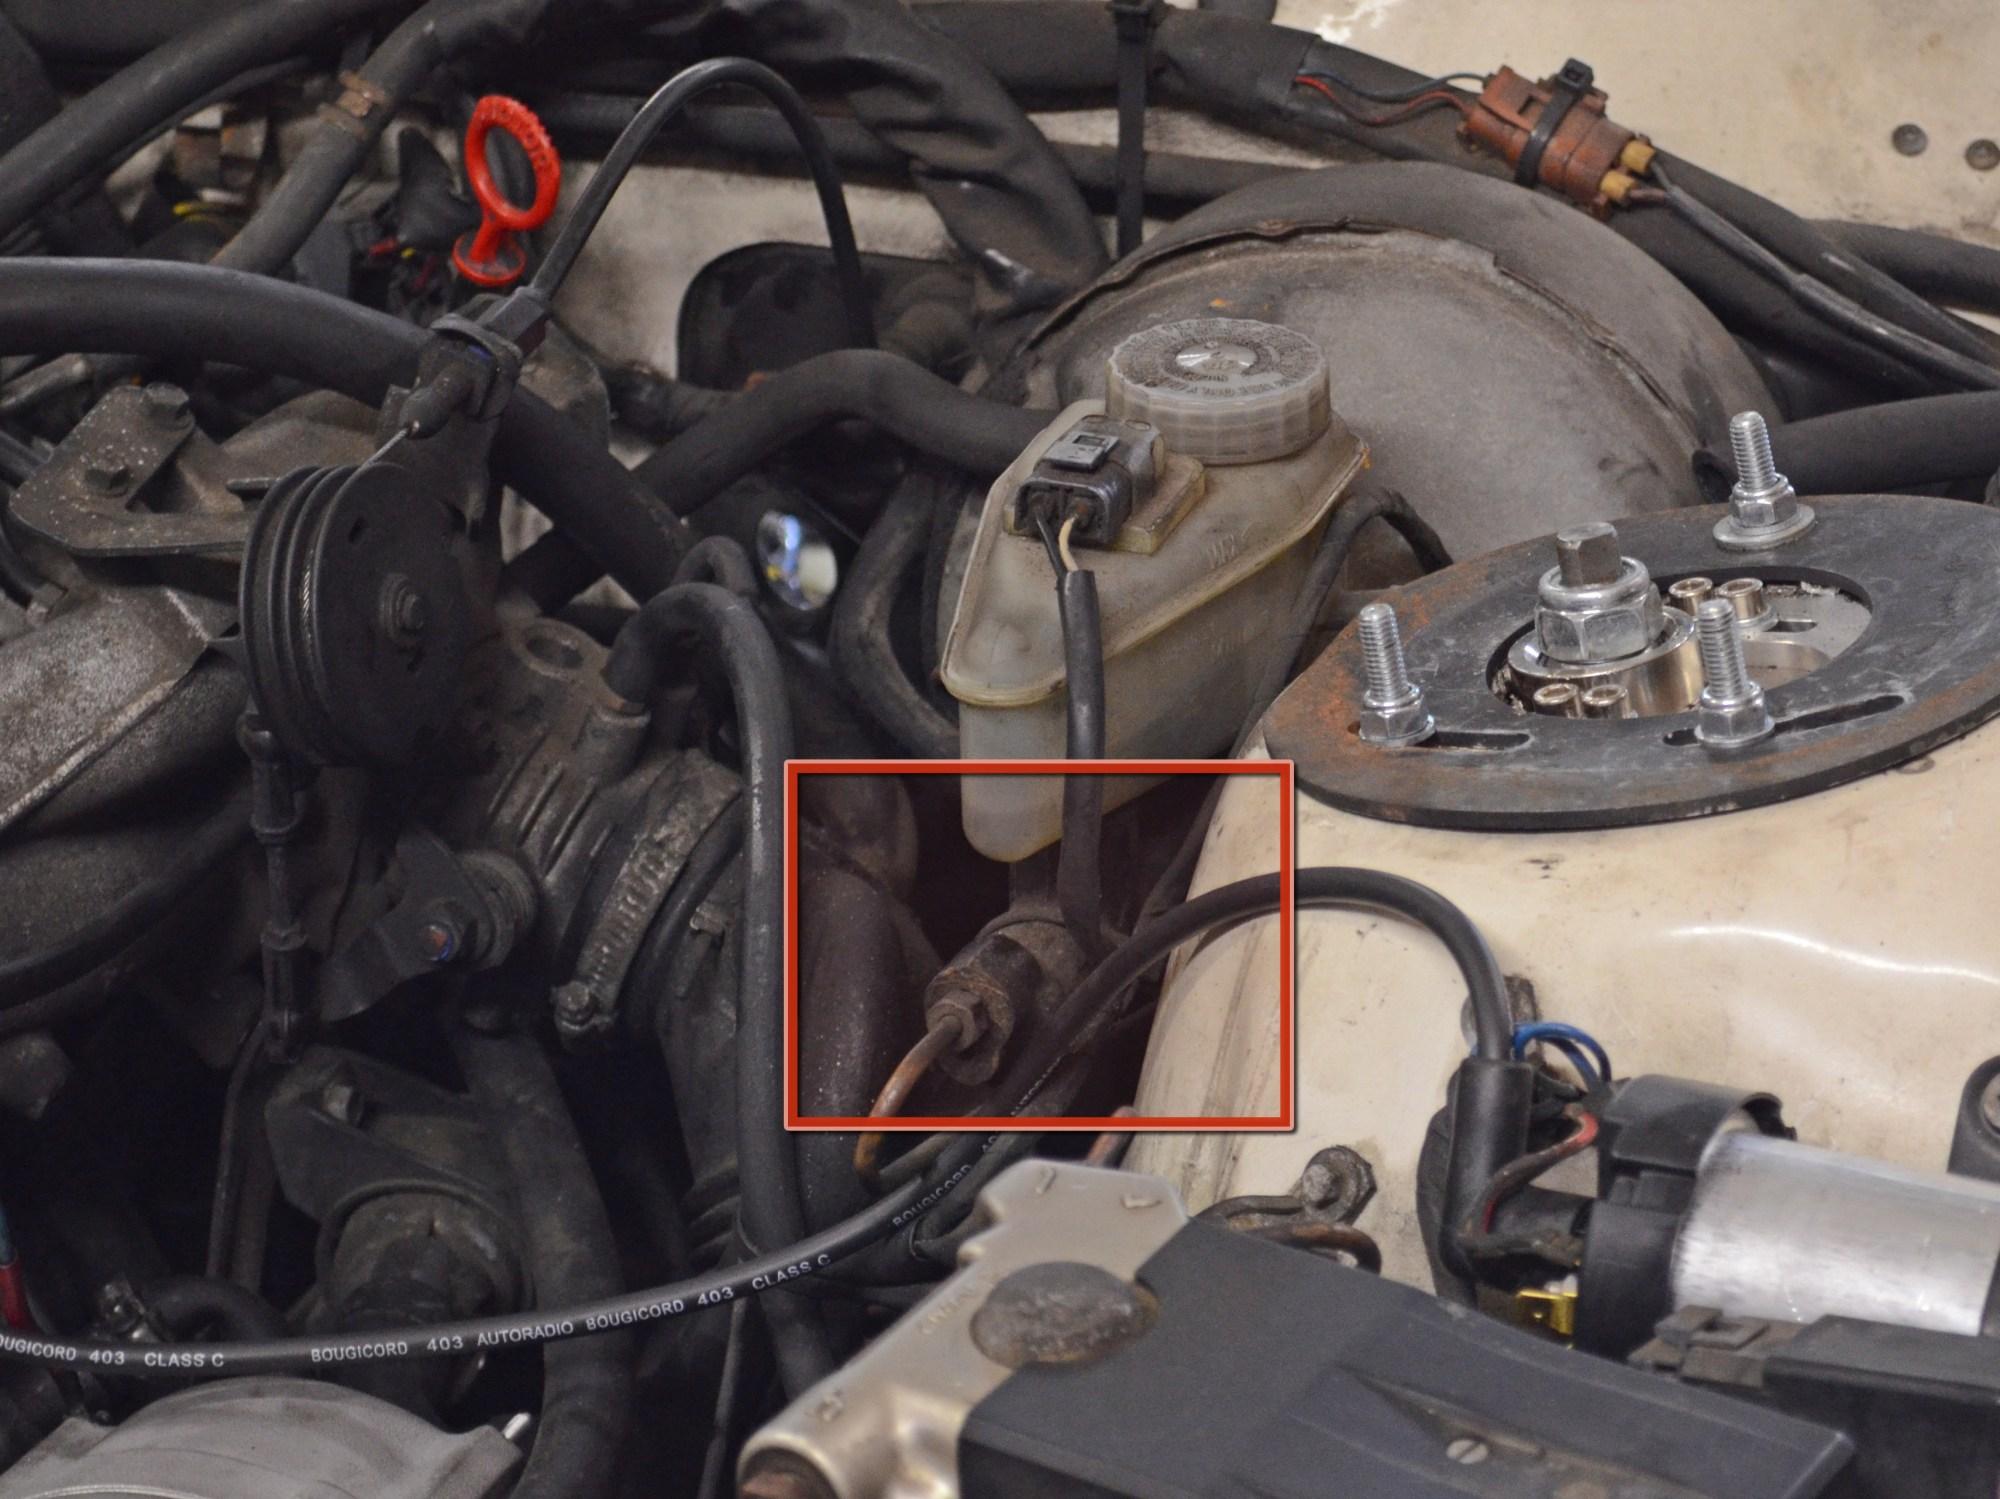 hight resolution of 1990 volvo 740 gle wagon engine diagram wiring